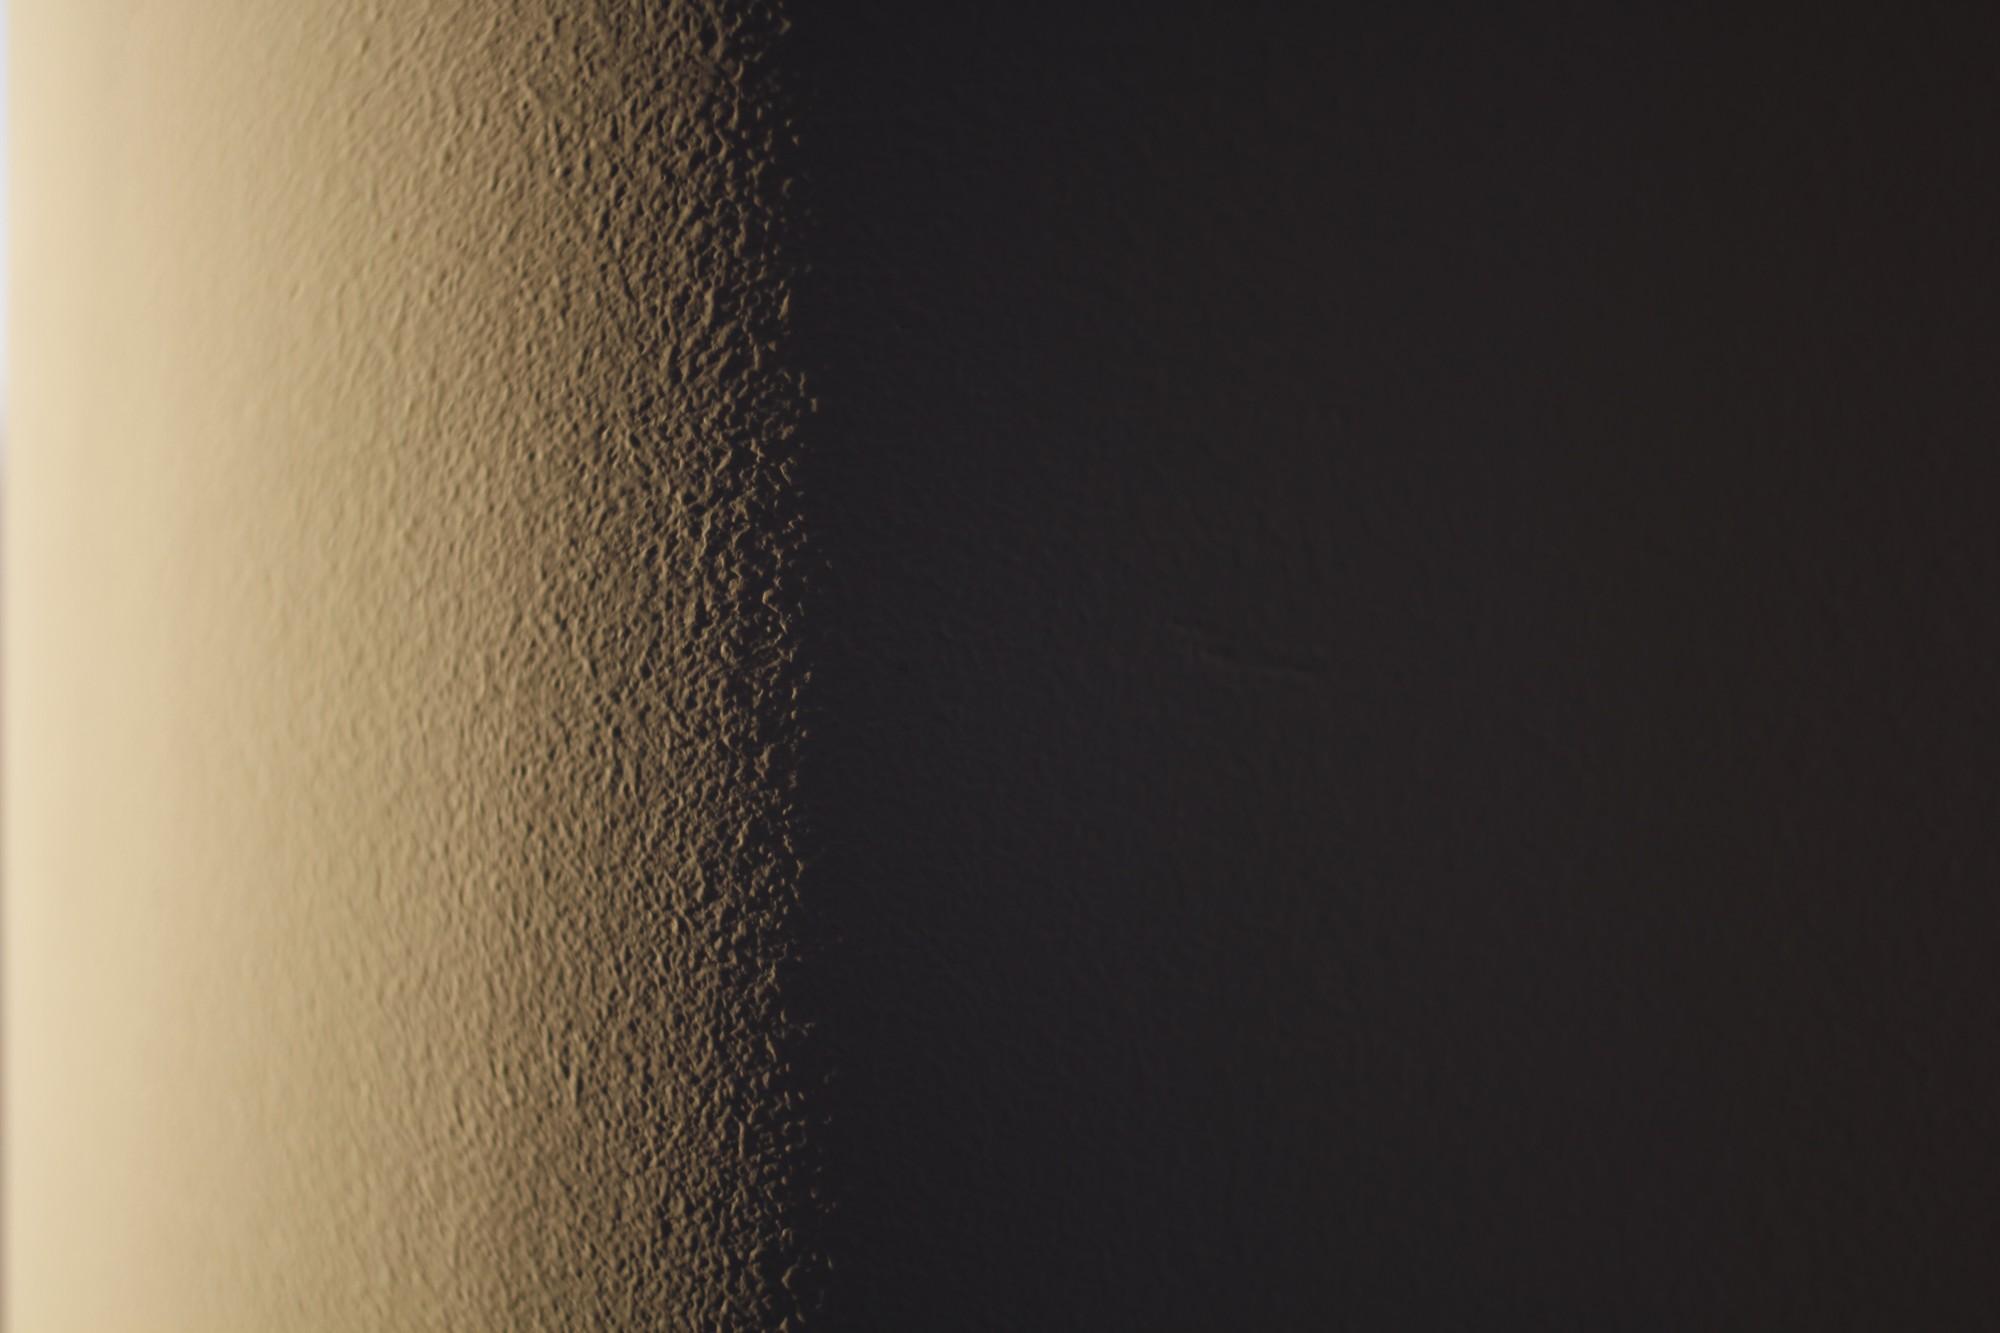 _mg_8278